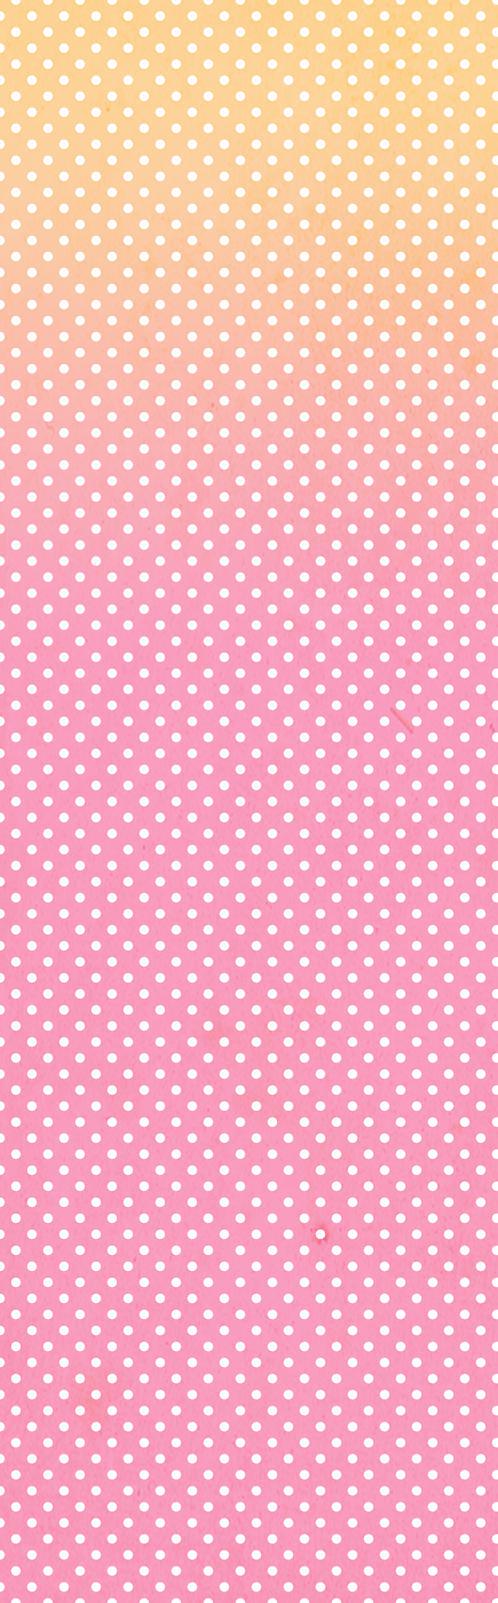 Polka-Dot CustomBox Background by Demachic